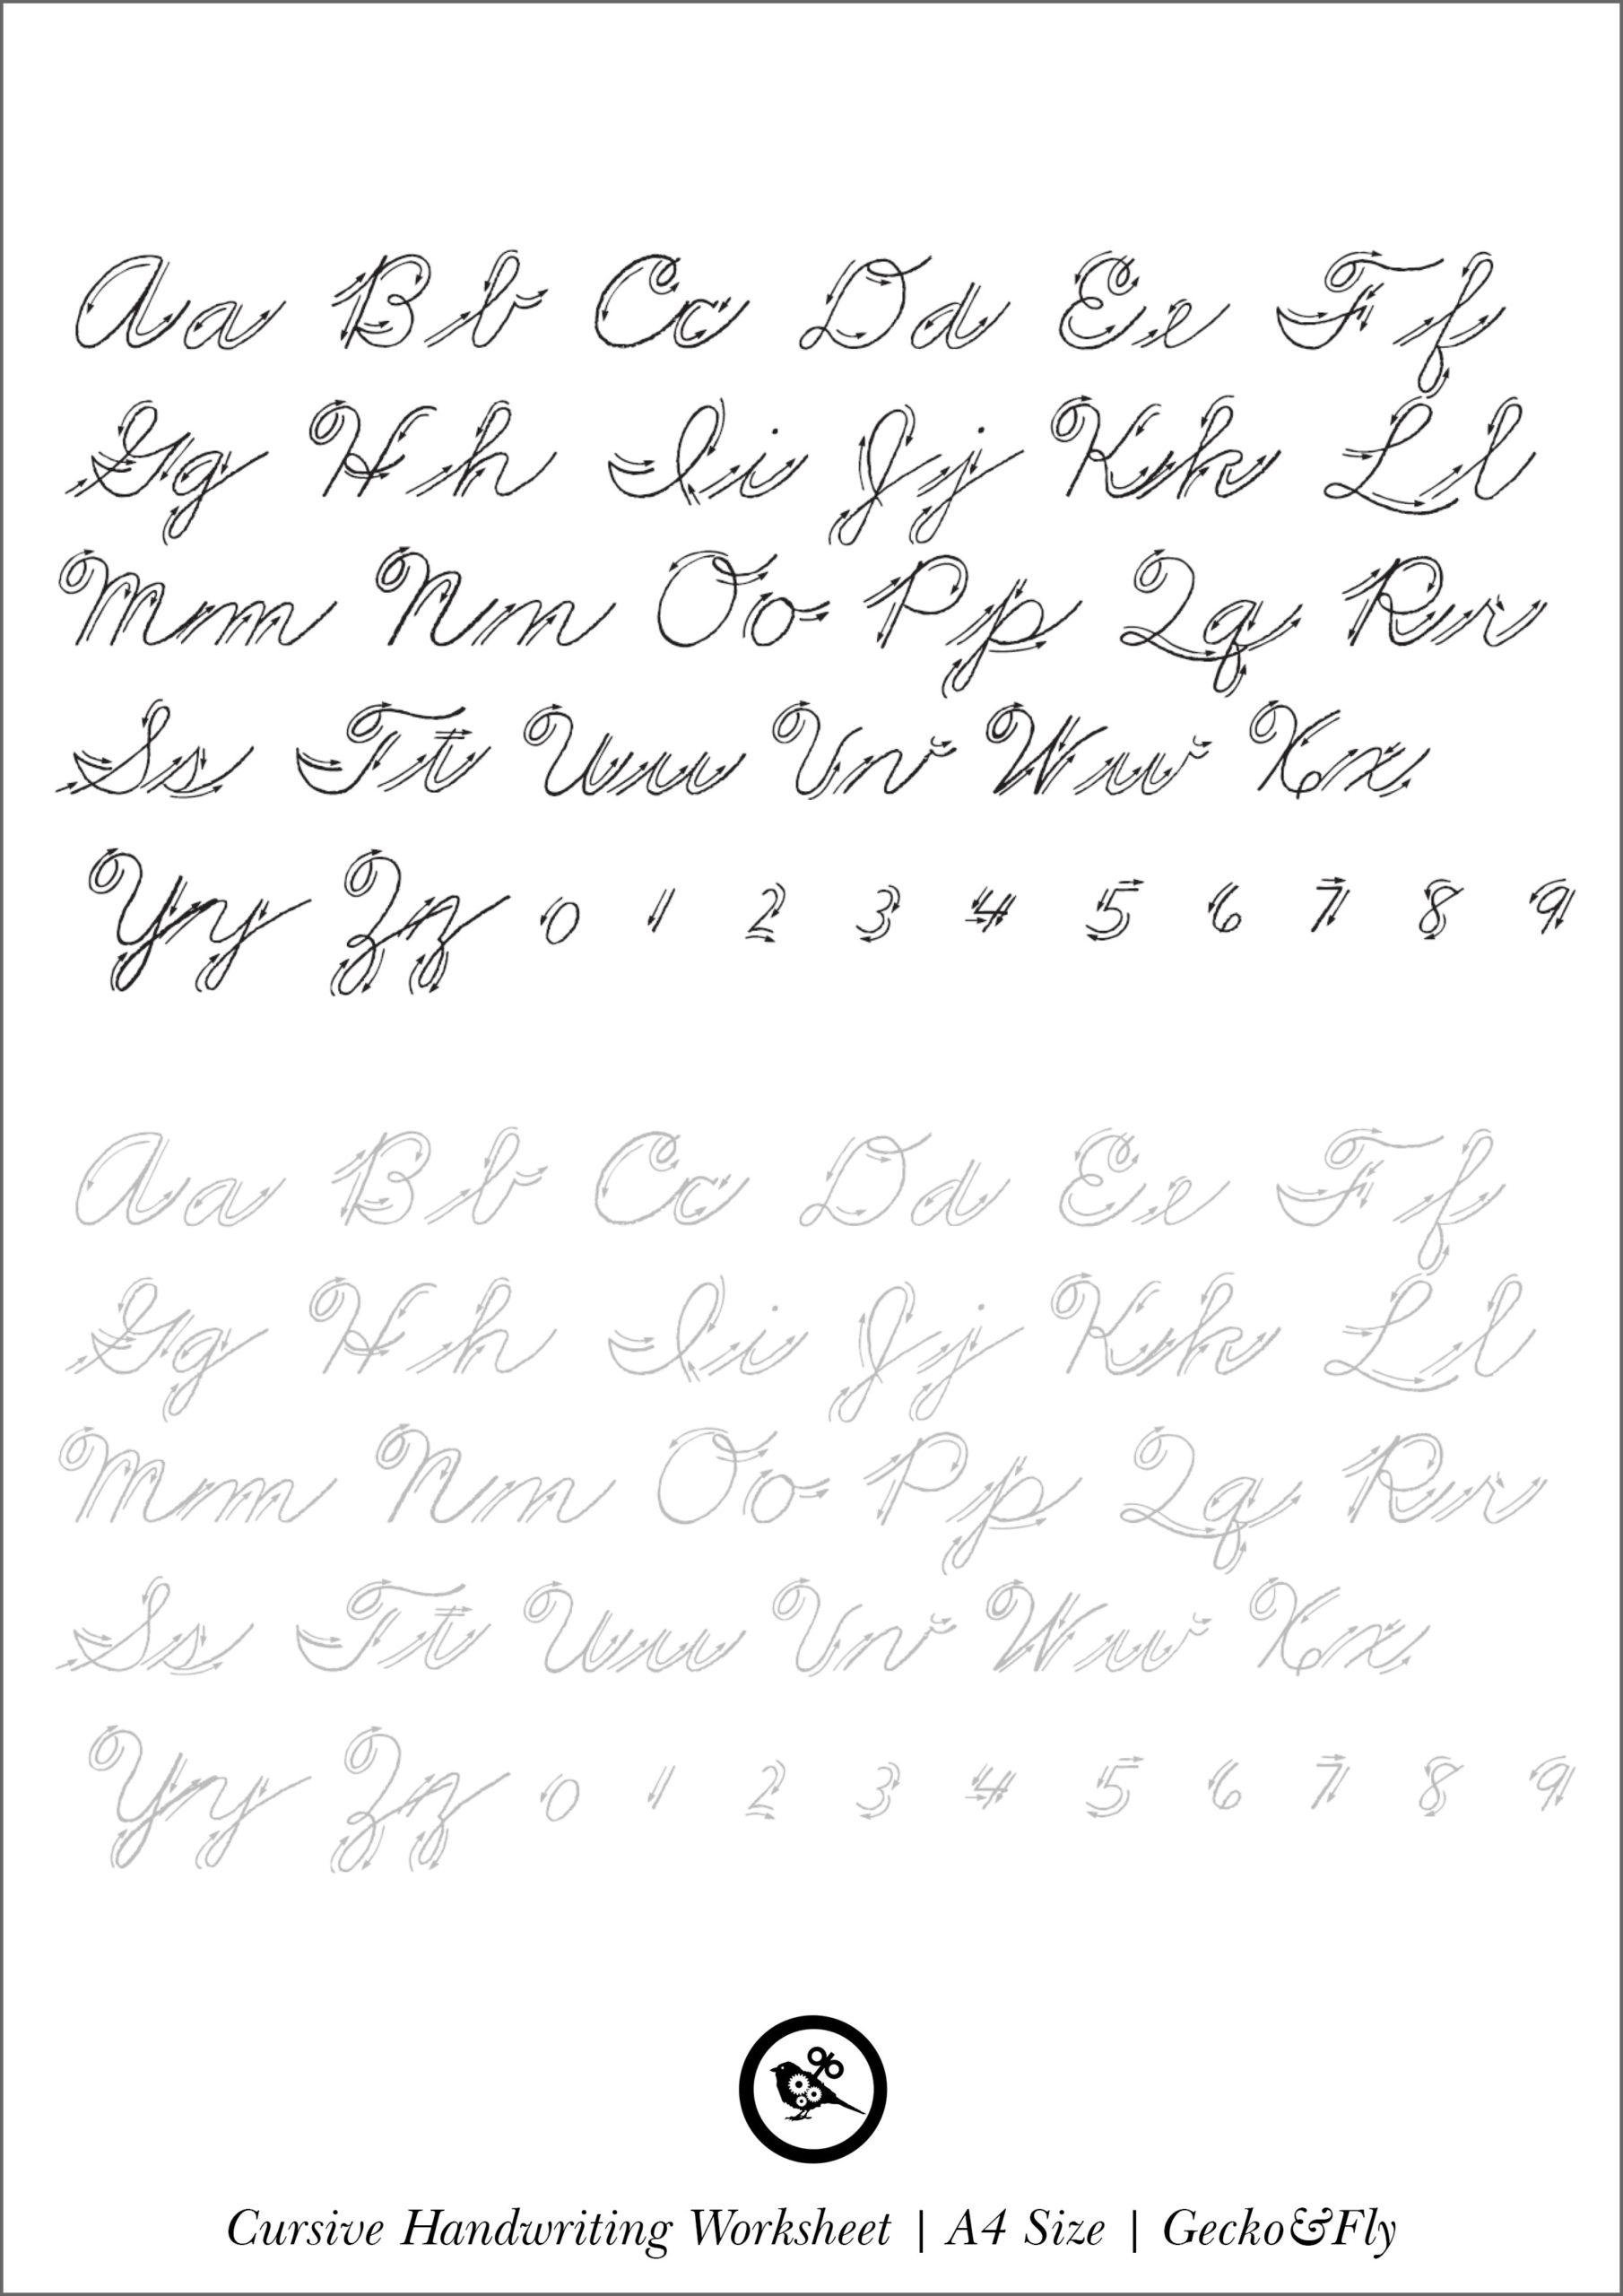 Make Your Own Cursive Handwriting Worksheets | Printable